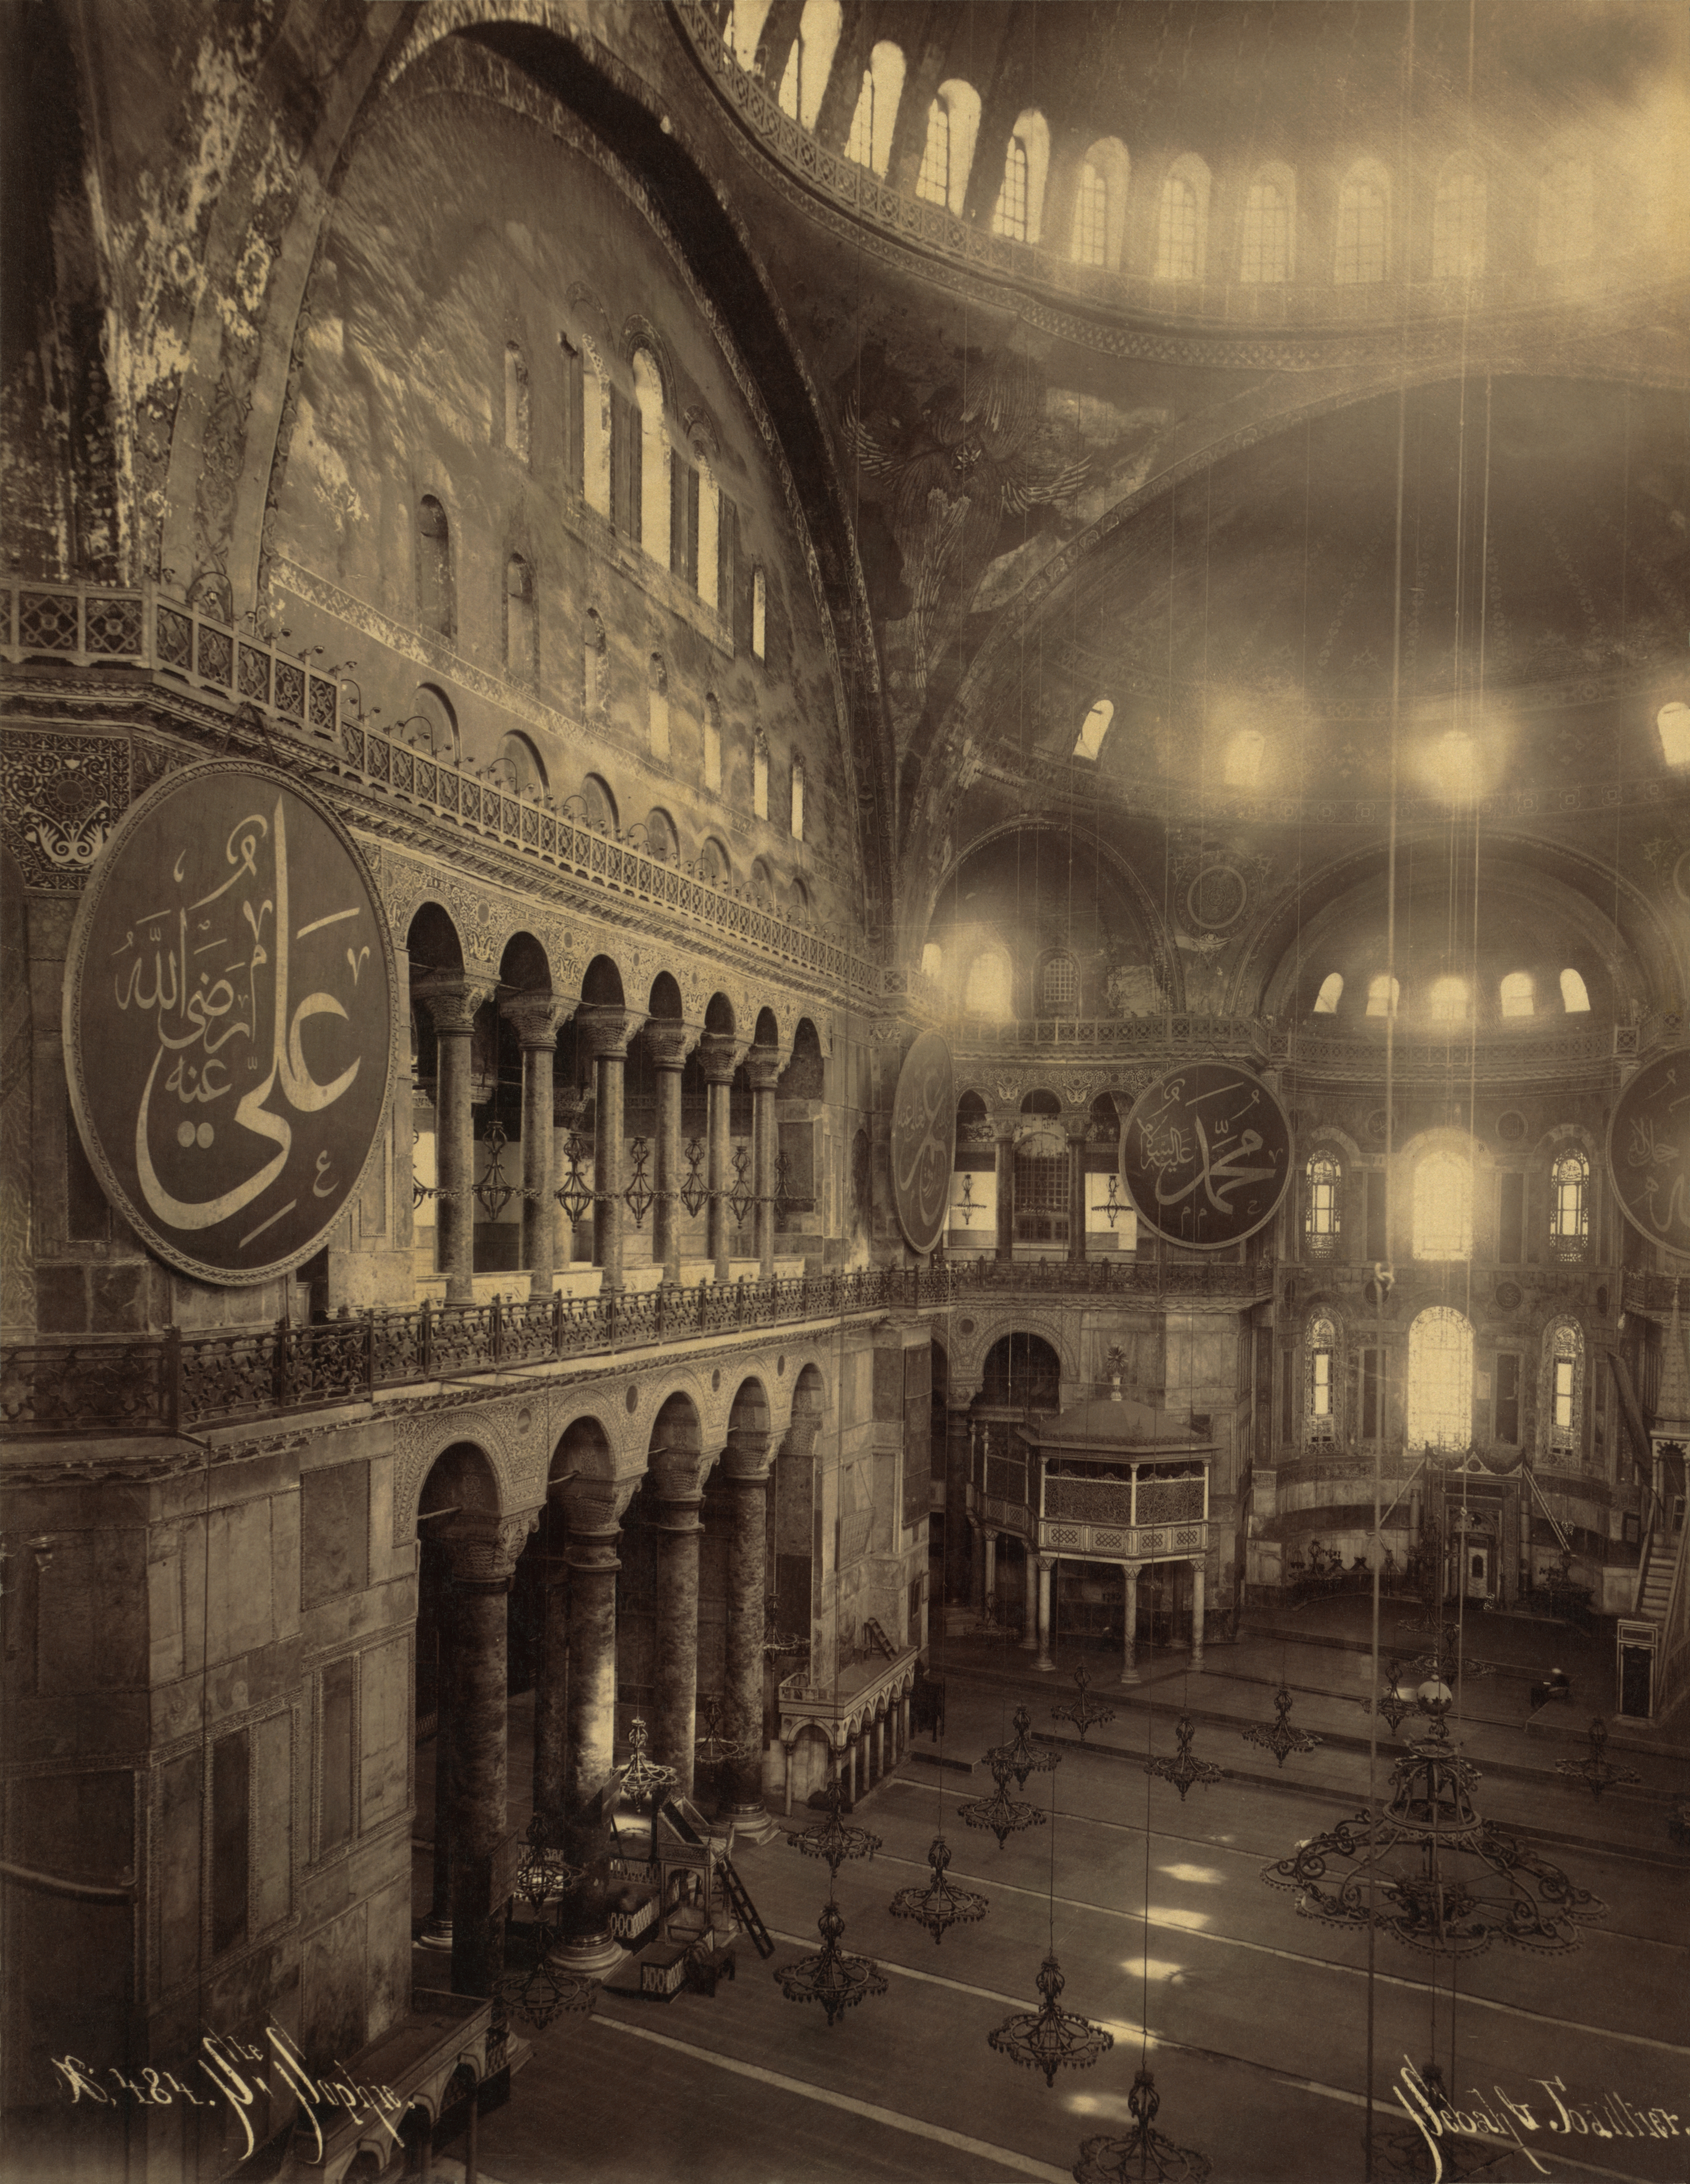 File:Sébah and Joaillier - Interior of Ayasofya Mosque.jpg - Wikipedia